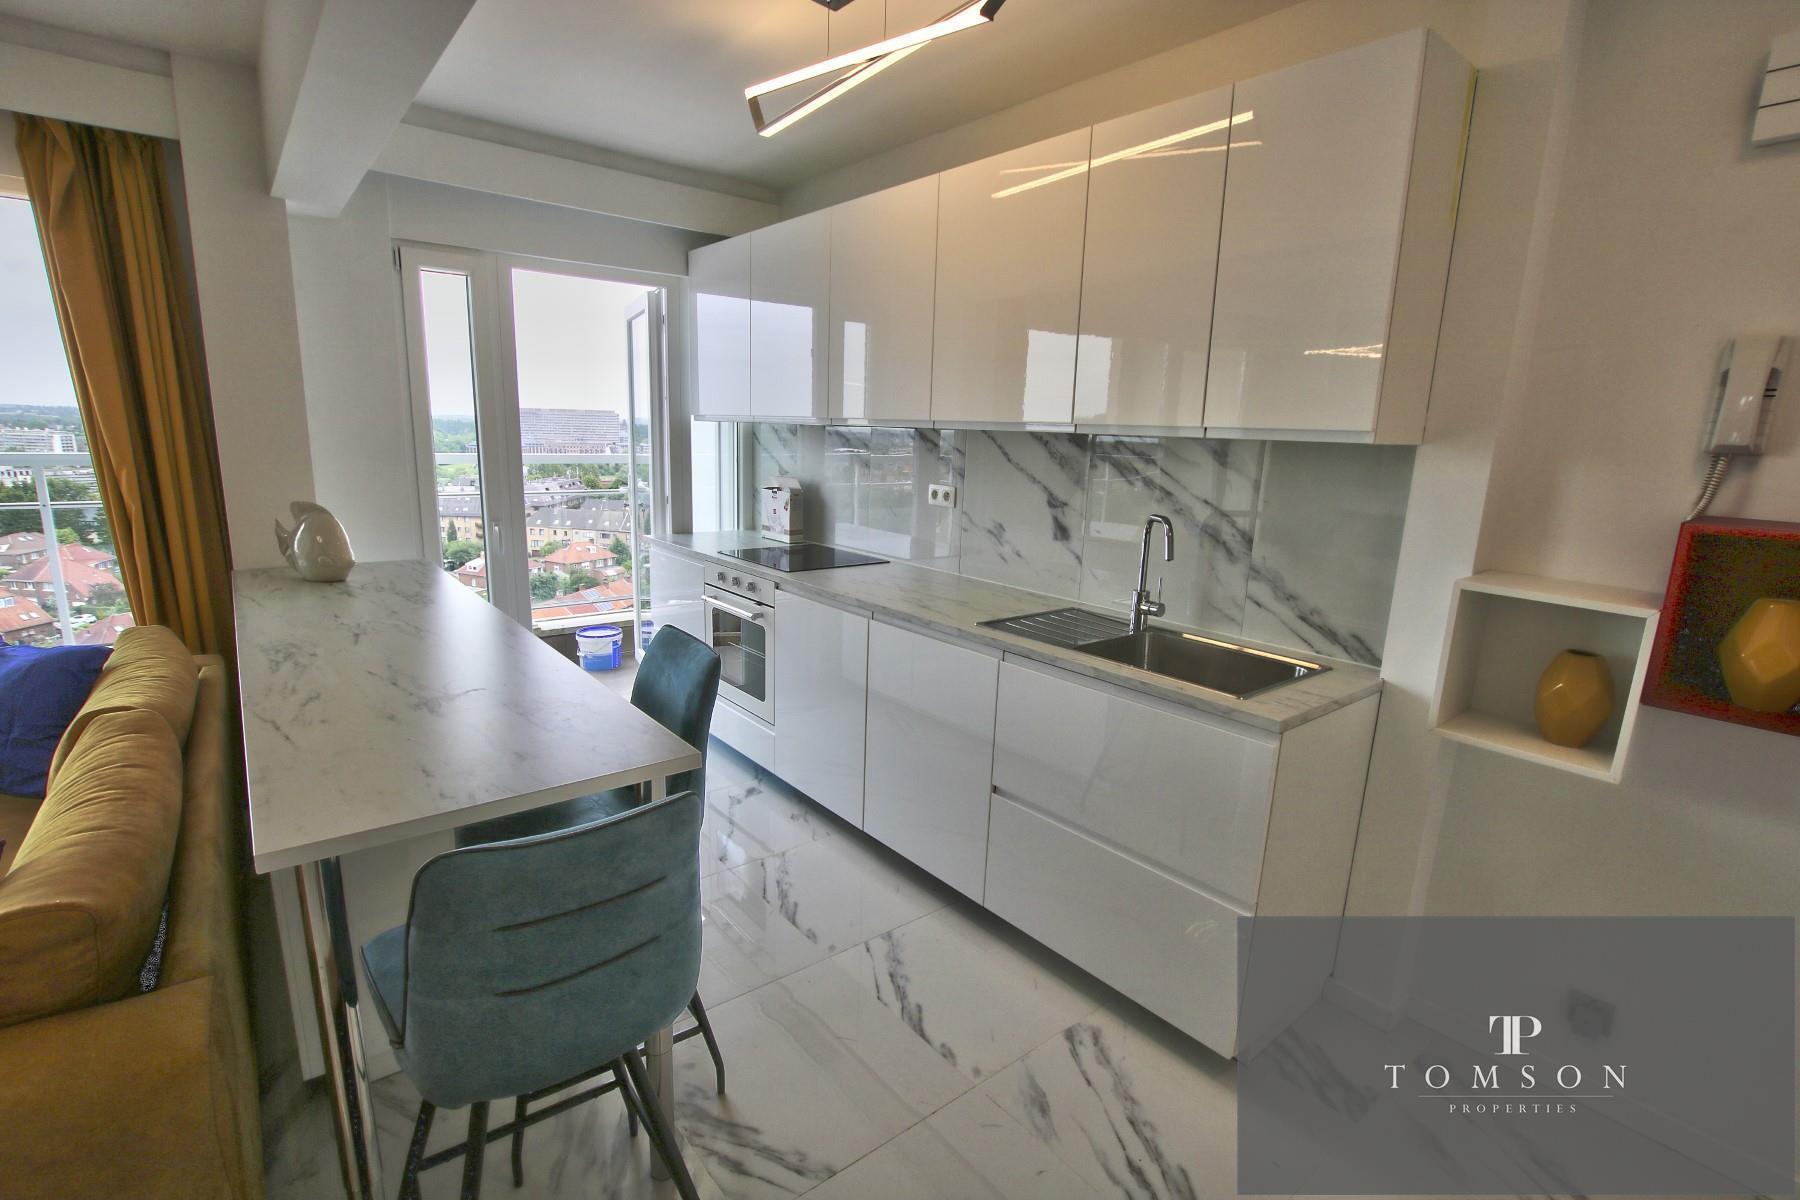 Appartement - Woluwe-Saint-Lambert - #4115211-2